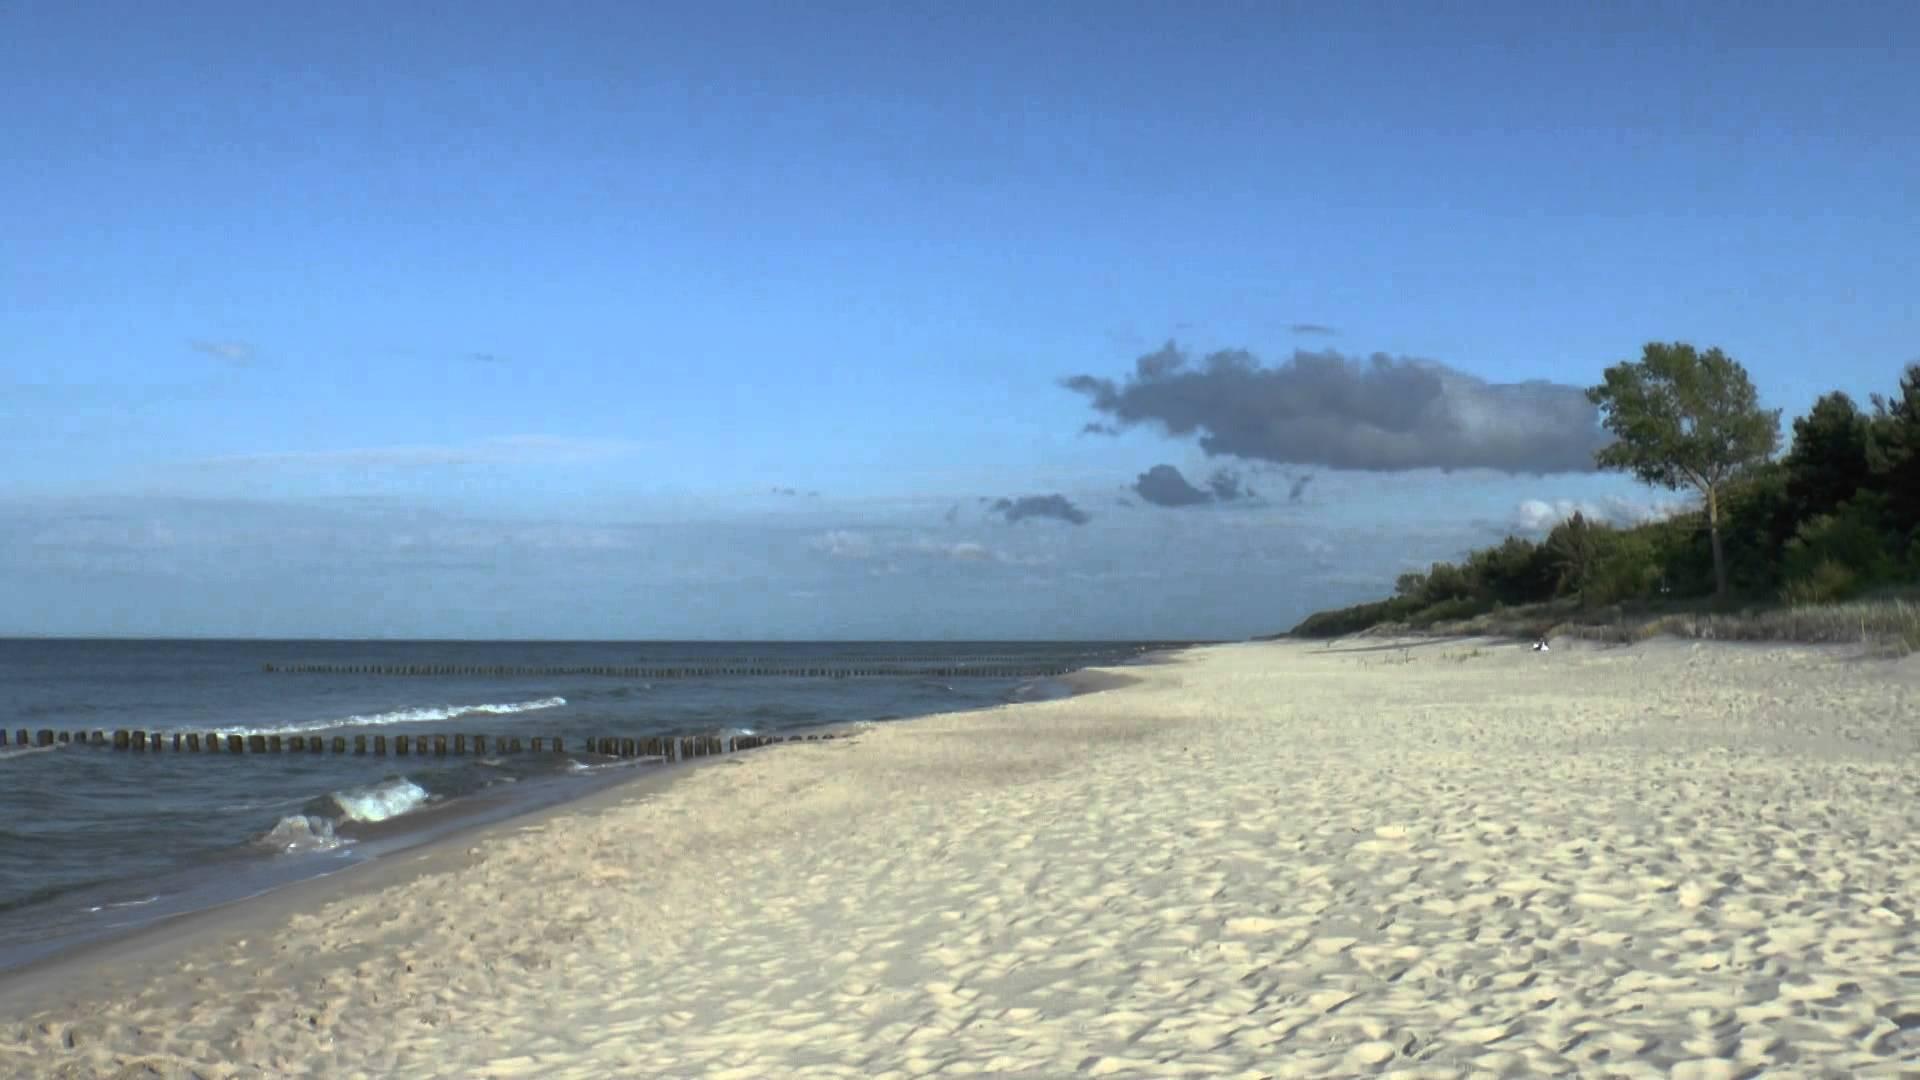 Chalupy beach